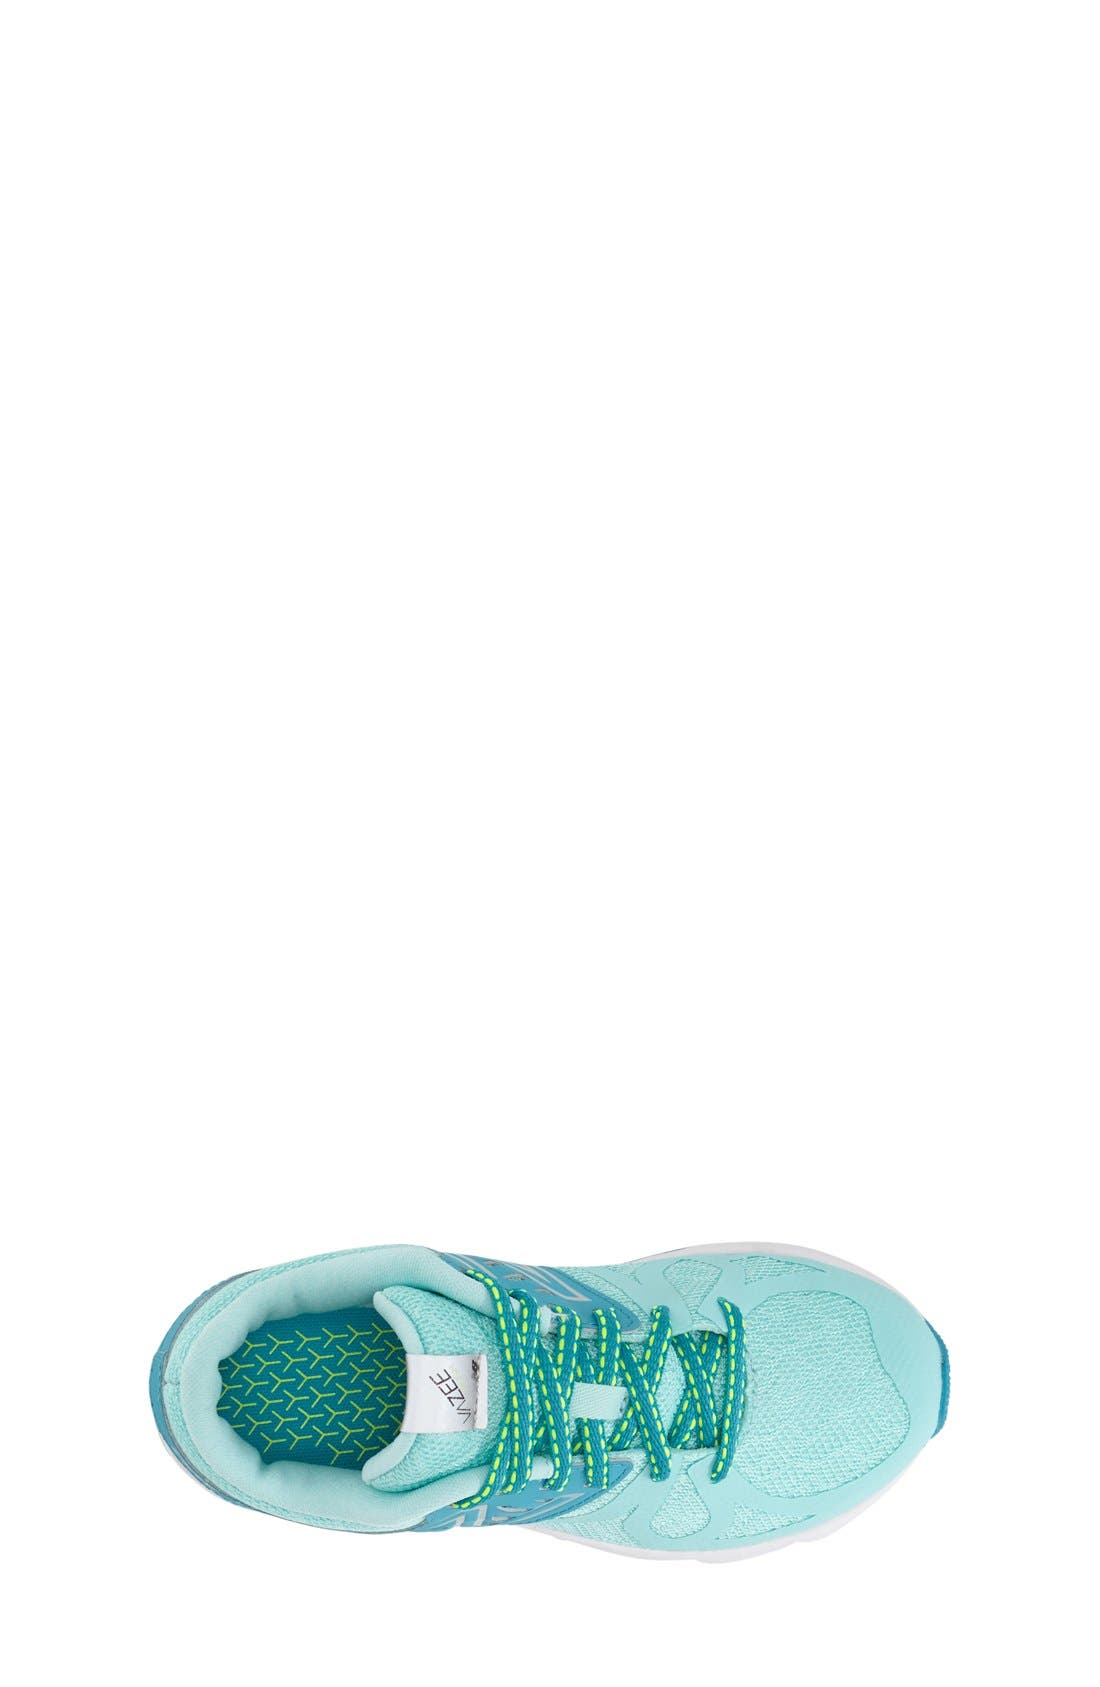 '200 Rush Vazee' Athletic Shoe,                             Alternate thumbnail 3, color,                             Sea Glass